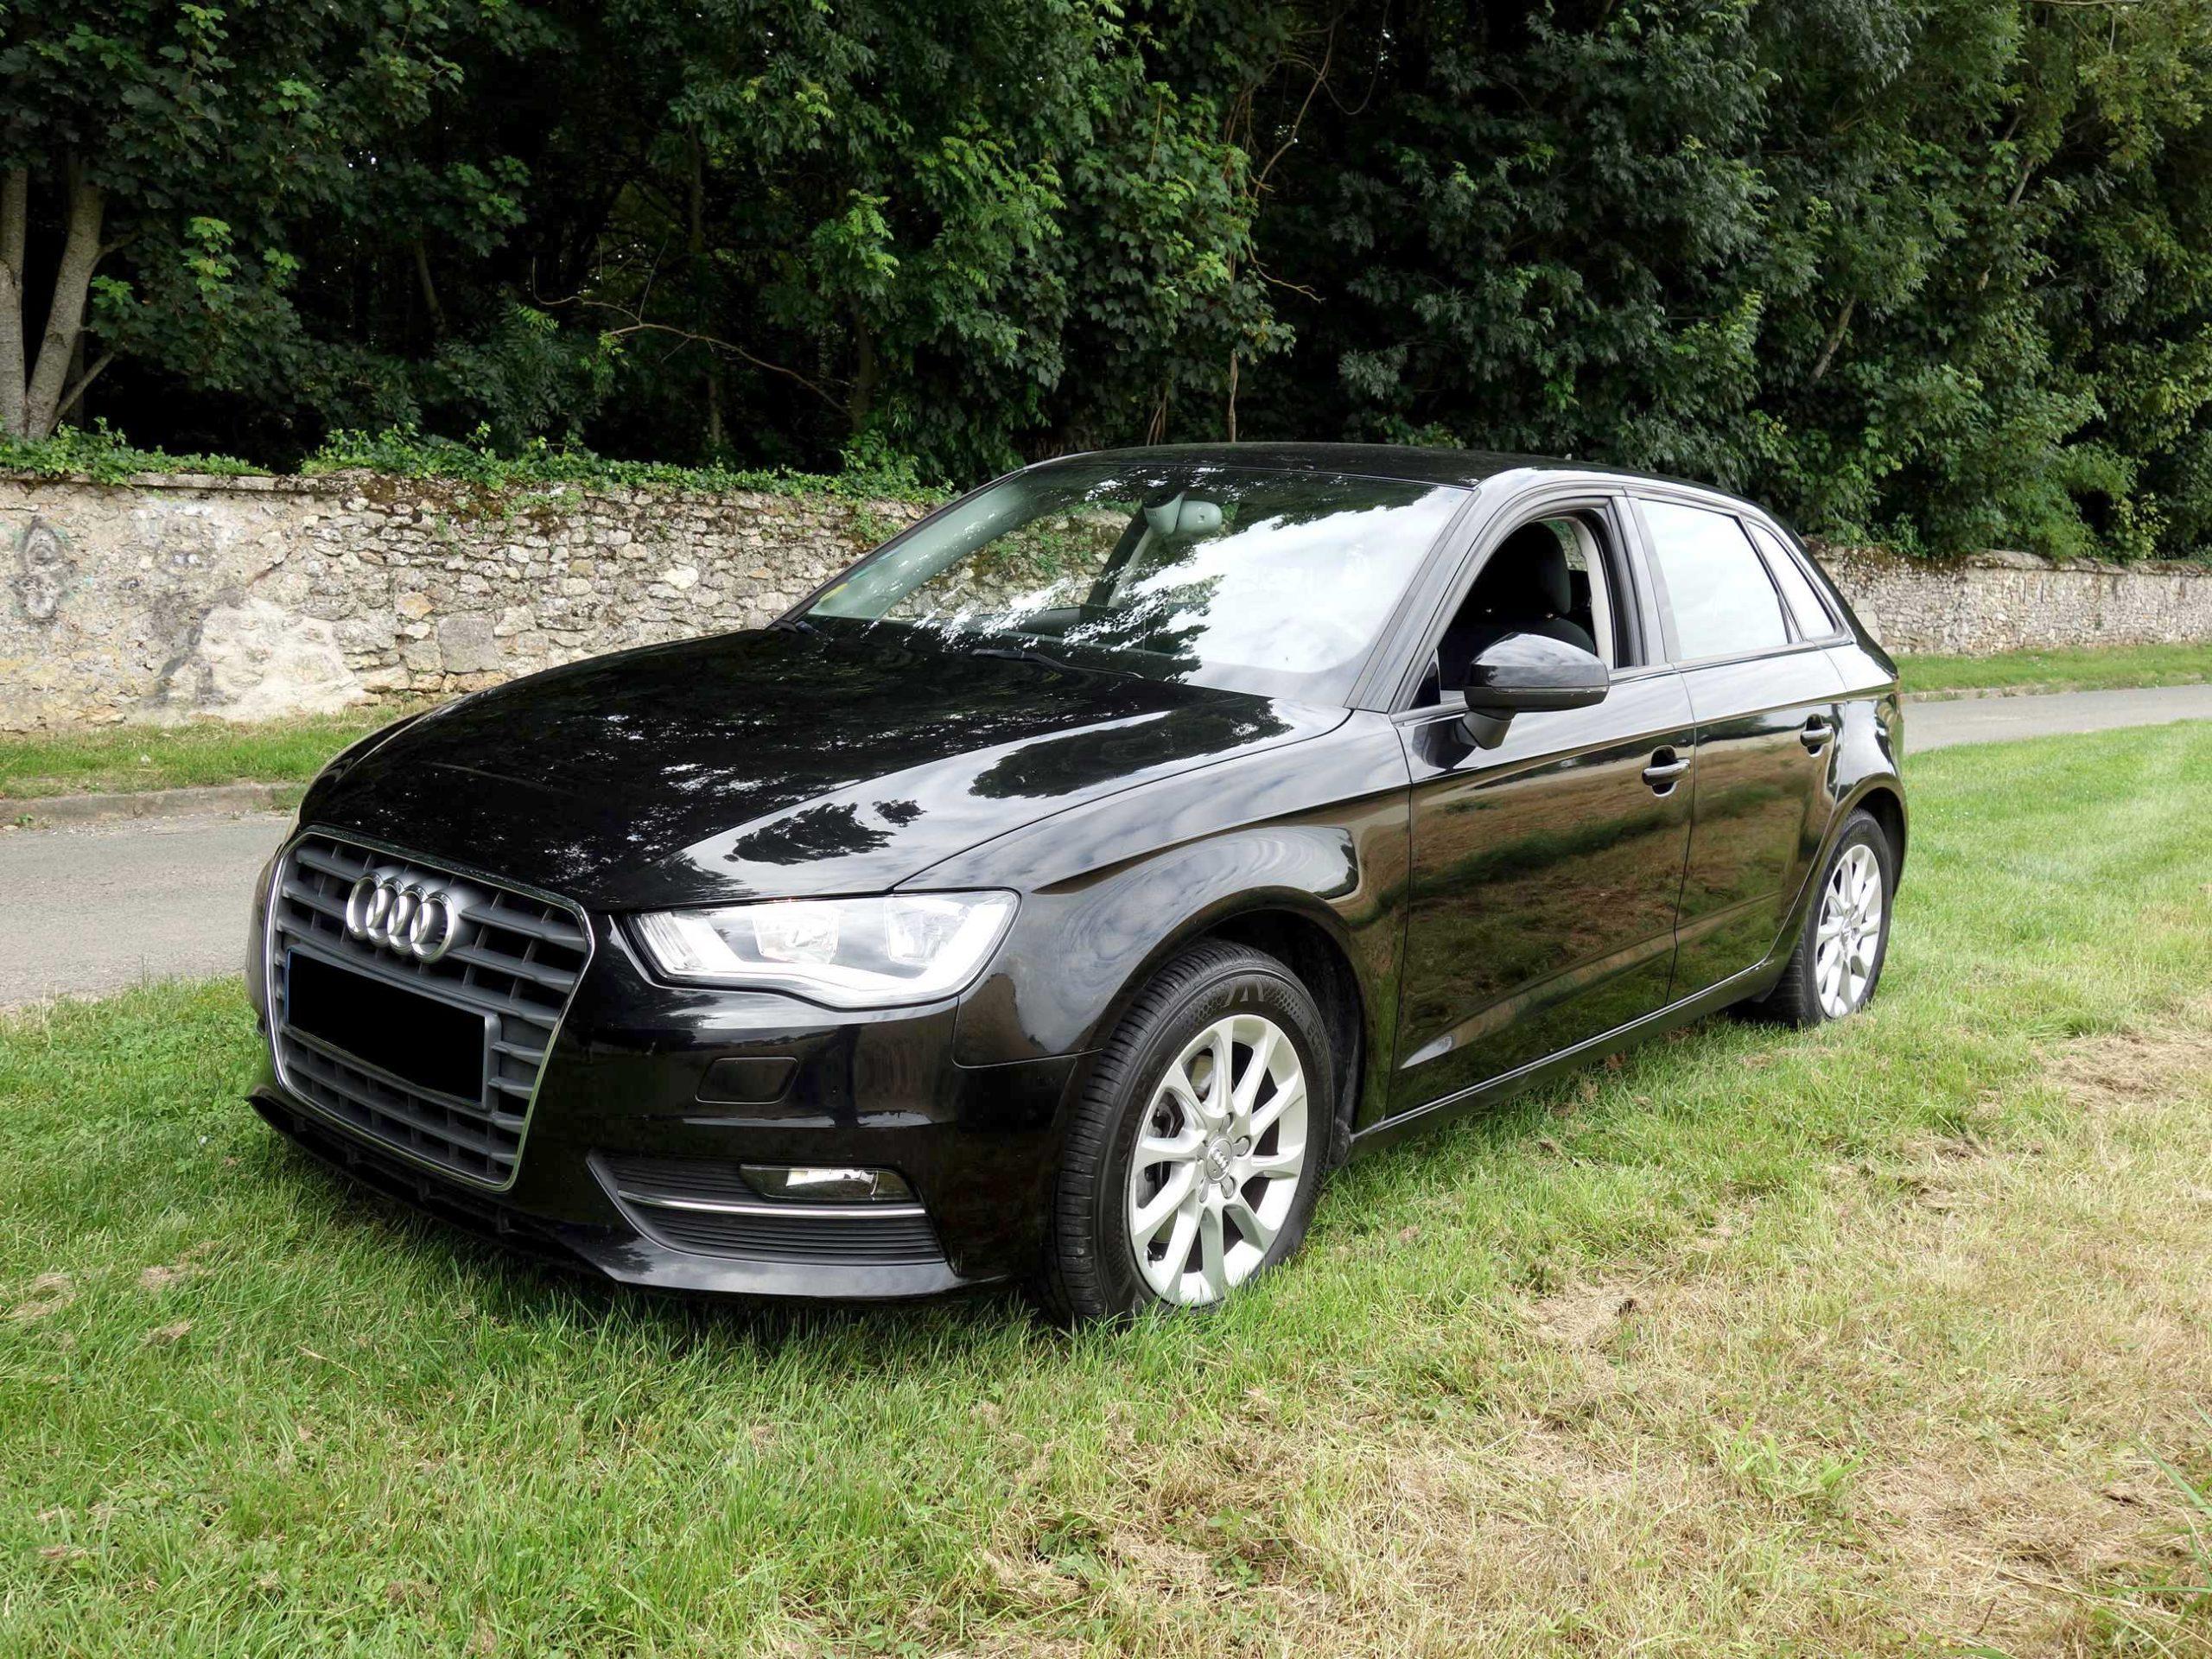 Audi A3 Sportback 1.6 TDI 105 S-tronic 7 Attraction